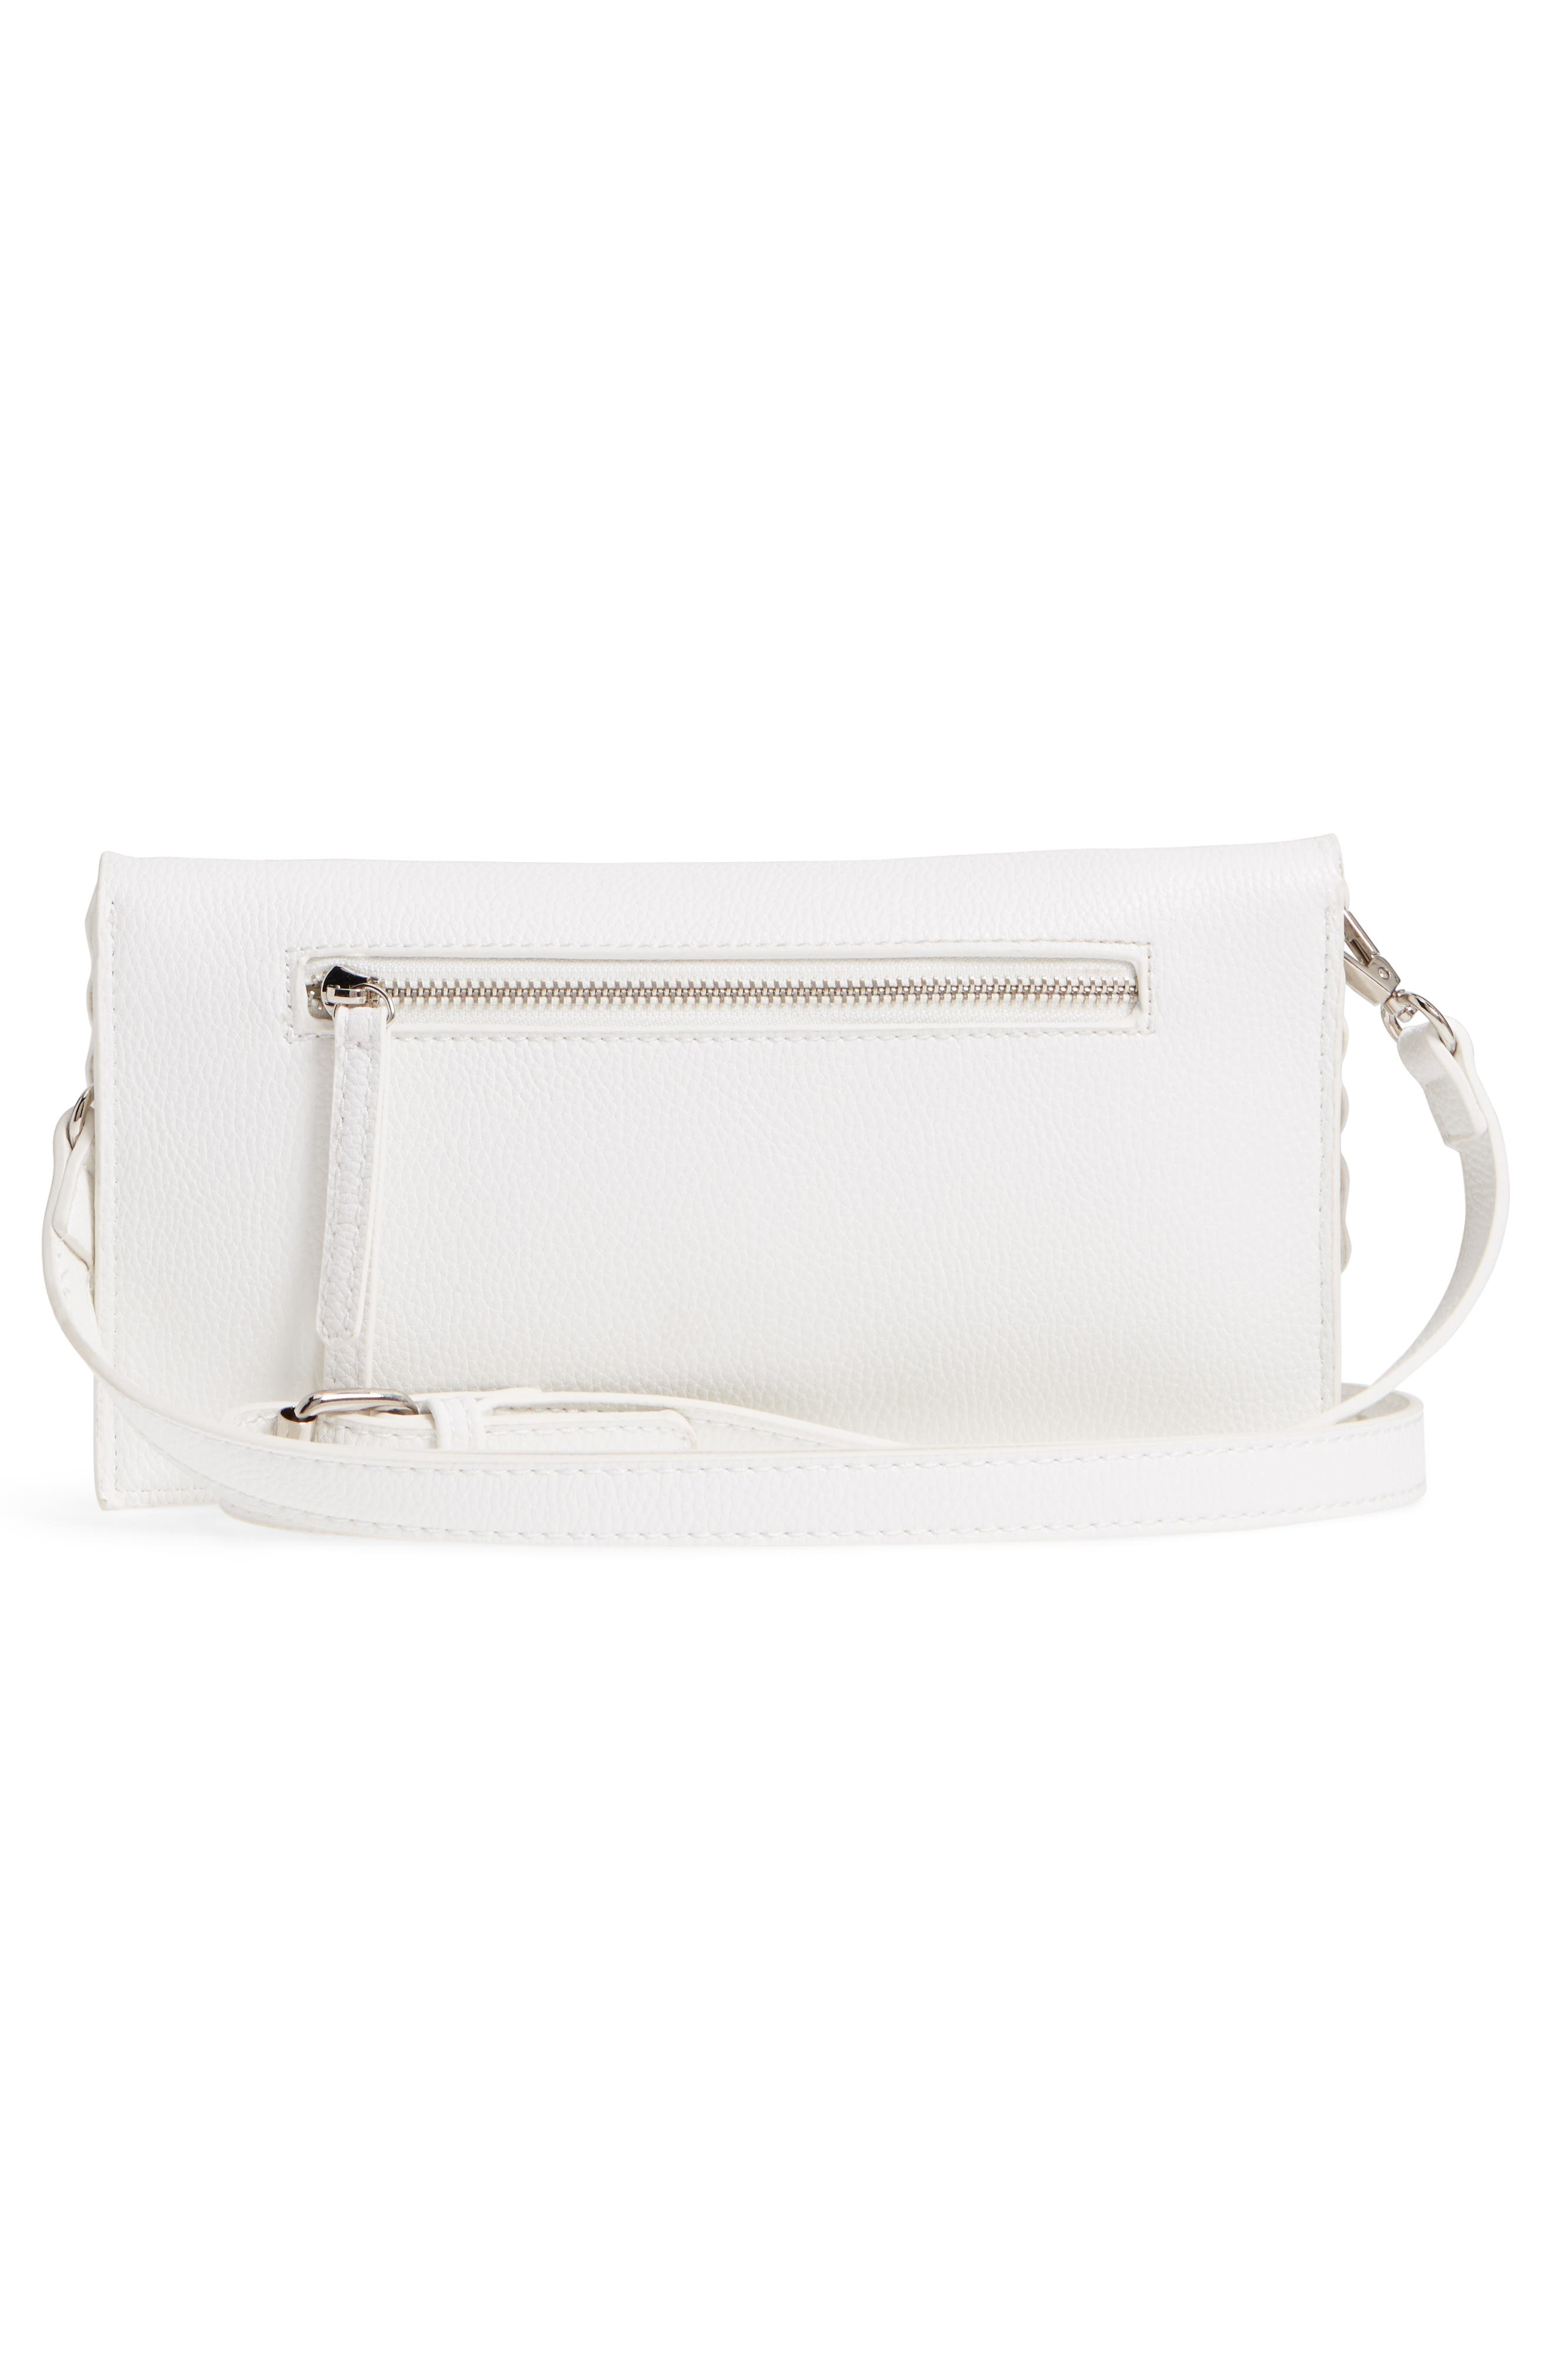 Grommet Convertible Crossbody Bag,                             Alternate thumbnail 4, color,                             100